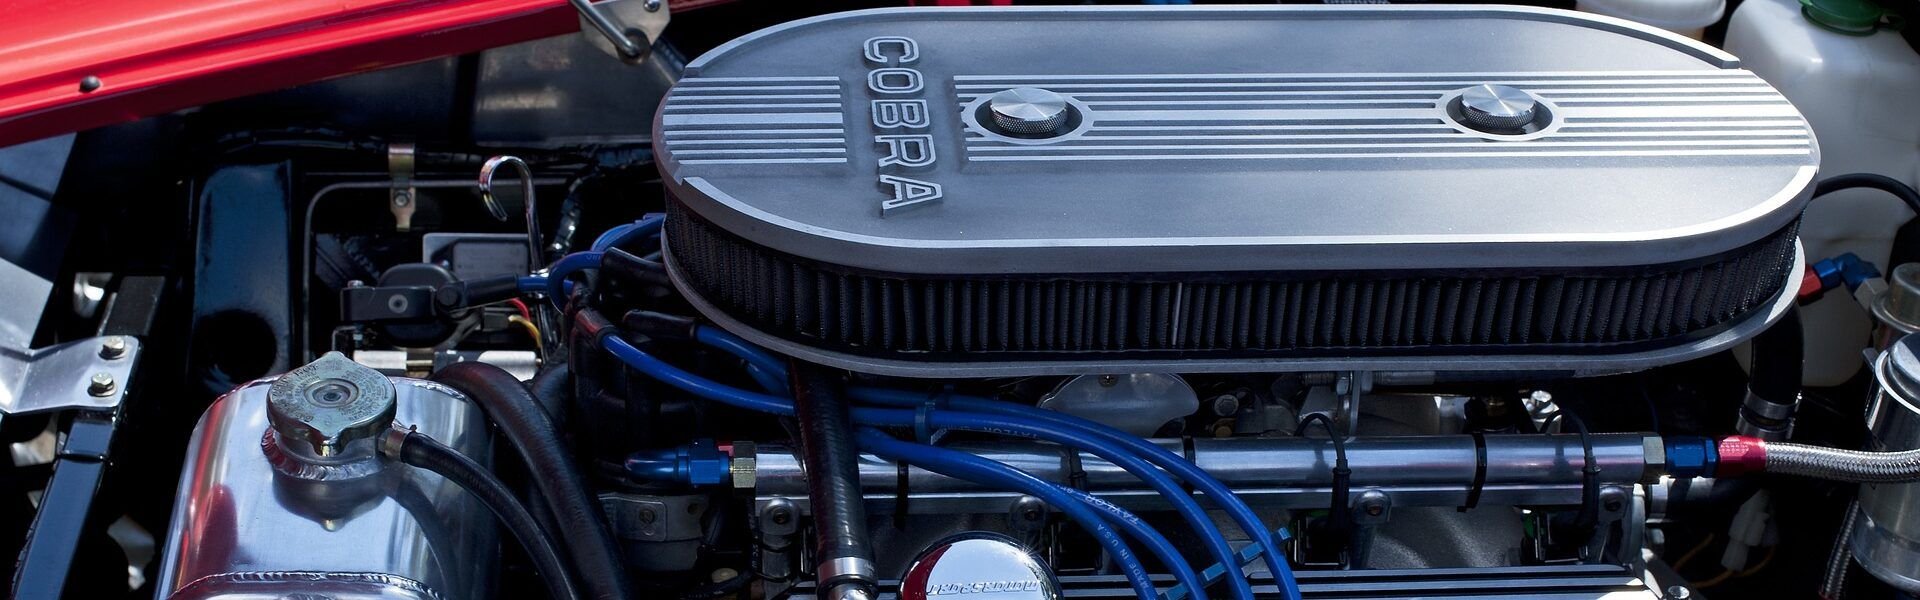 filtros-aceite-coches